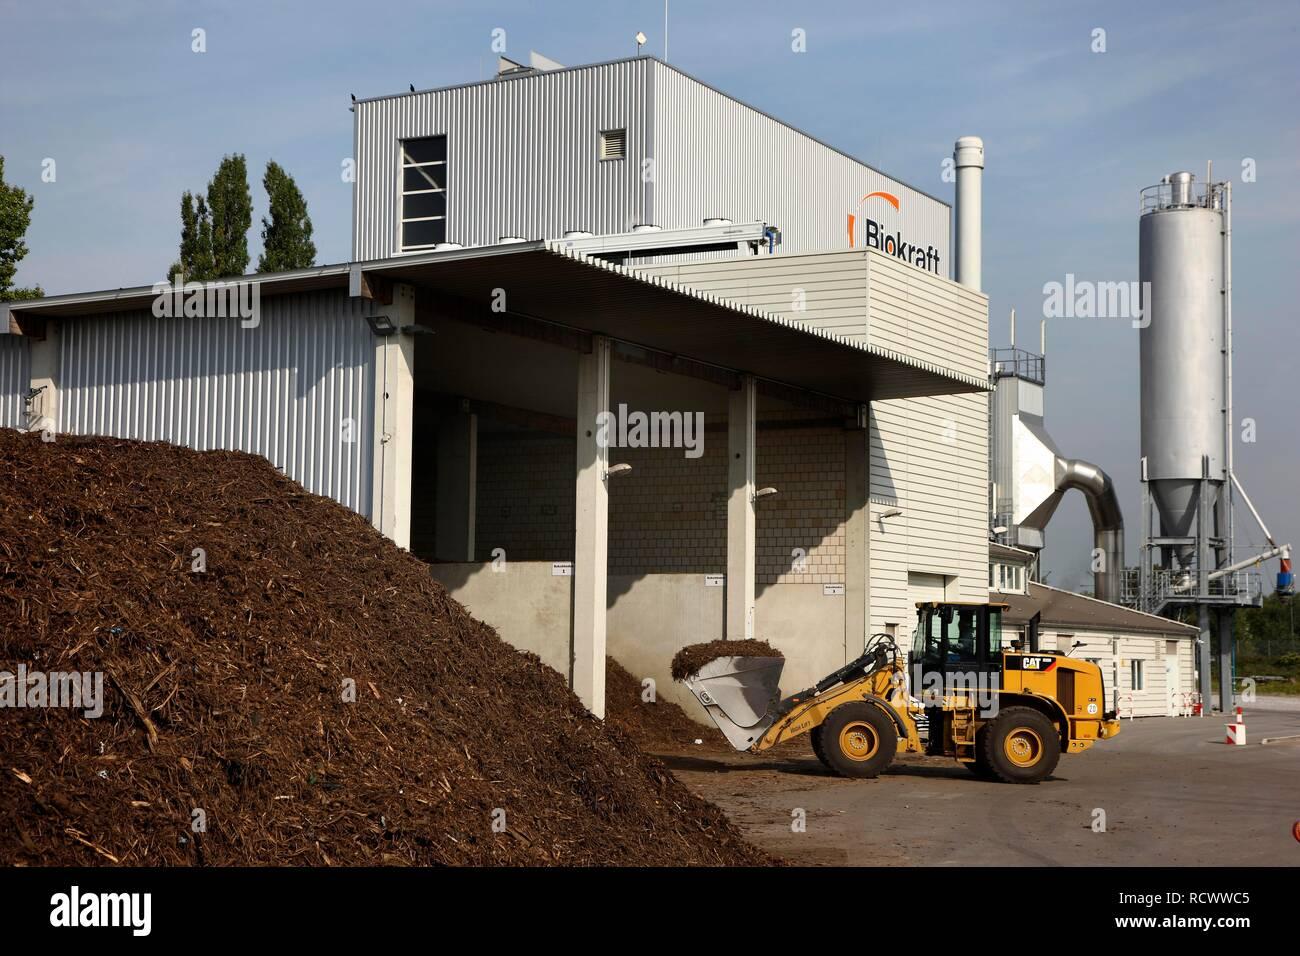 Bunker Fuel Stock Photos & Bunker Fuel Stock Images - Alamy